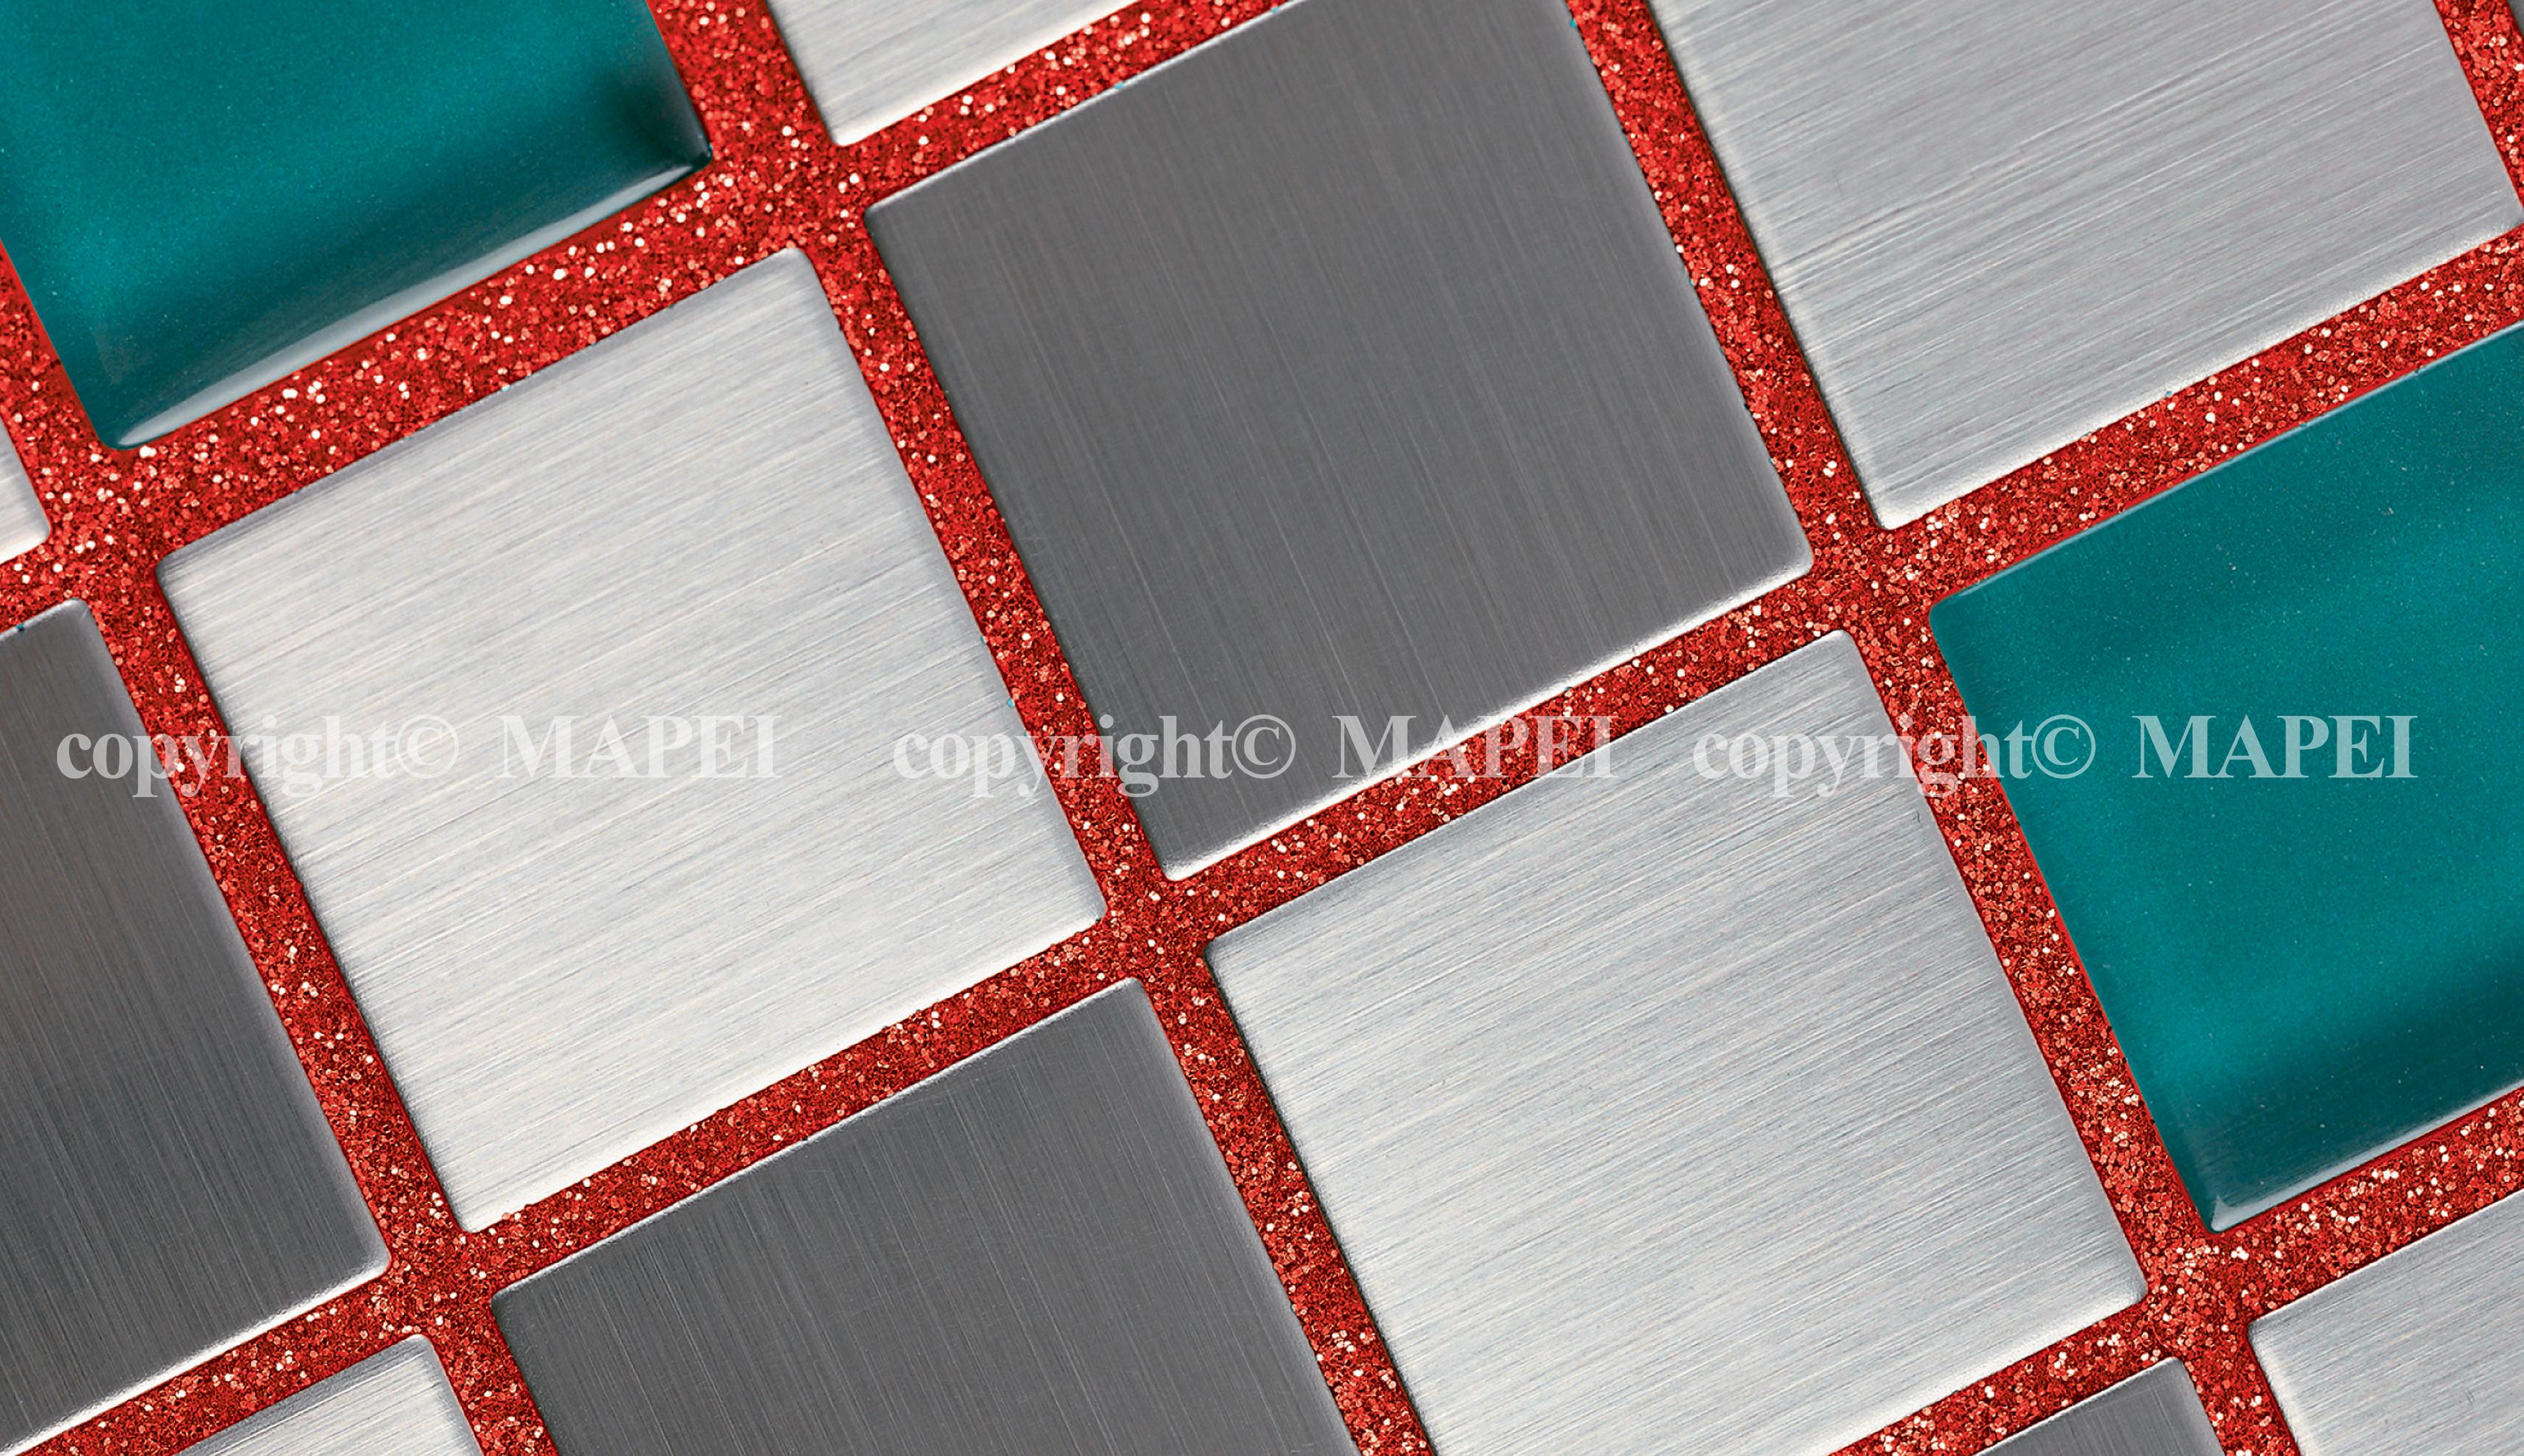 7. mozaic mixt vitroceramic metal MAPEI - Poza 8